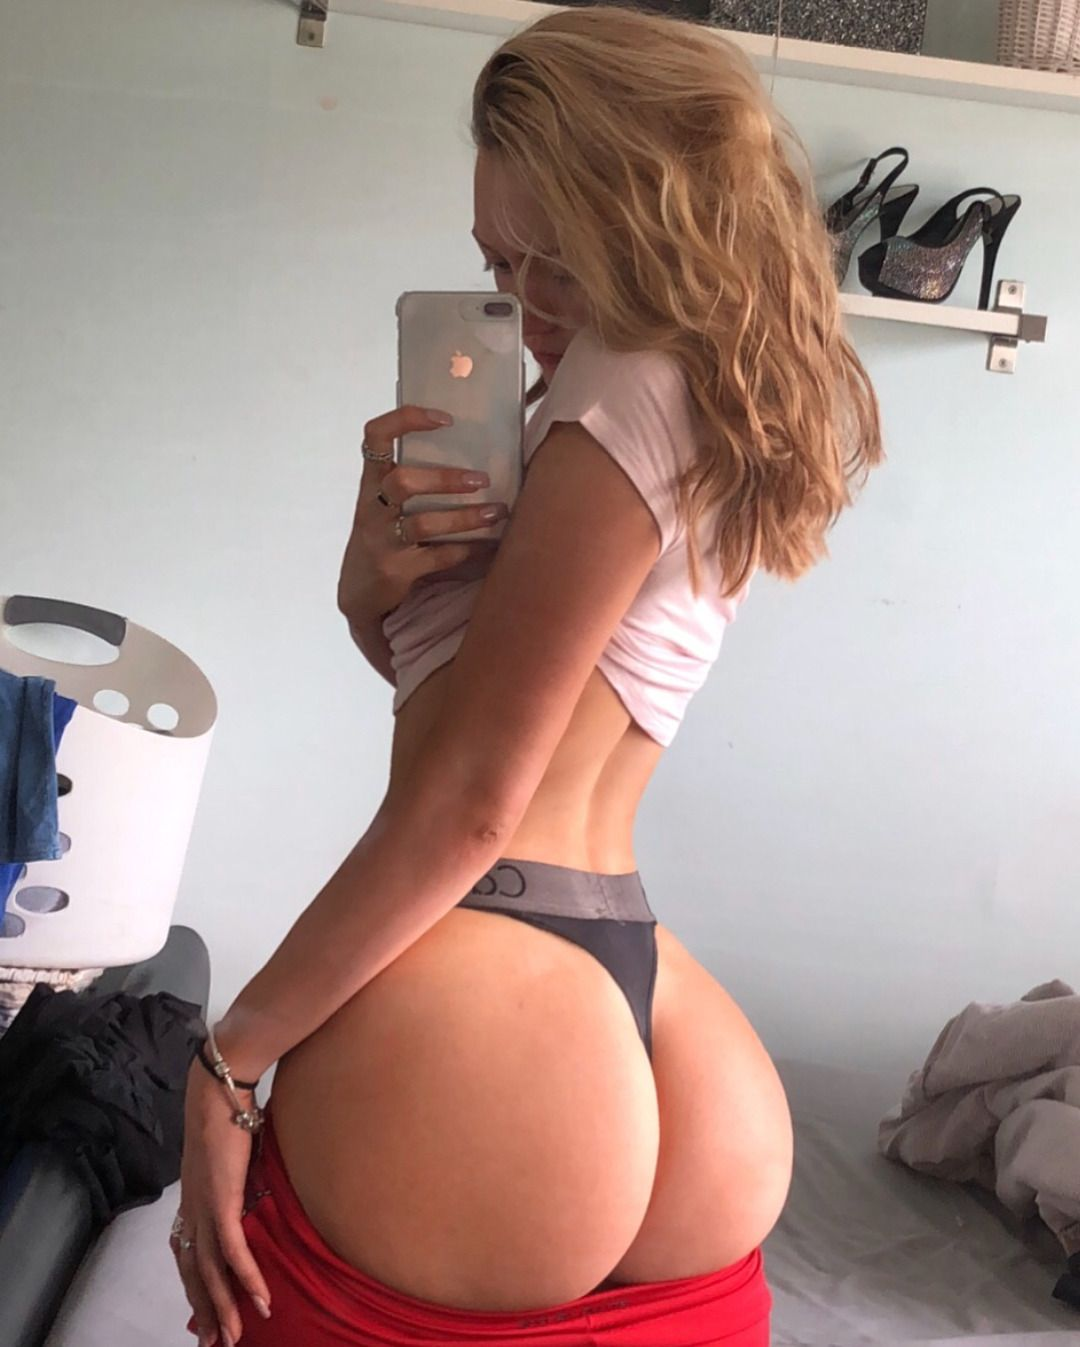 Chloe big ass milf